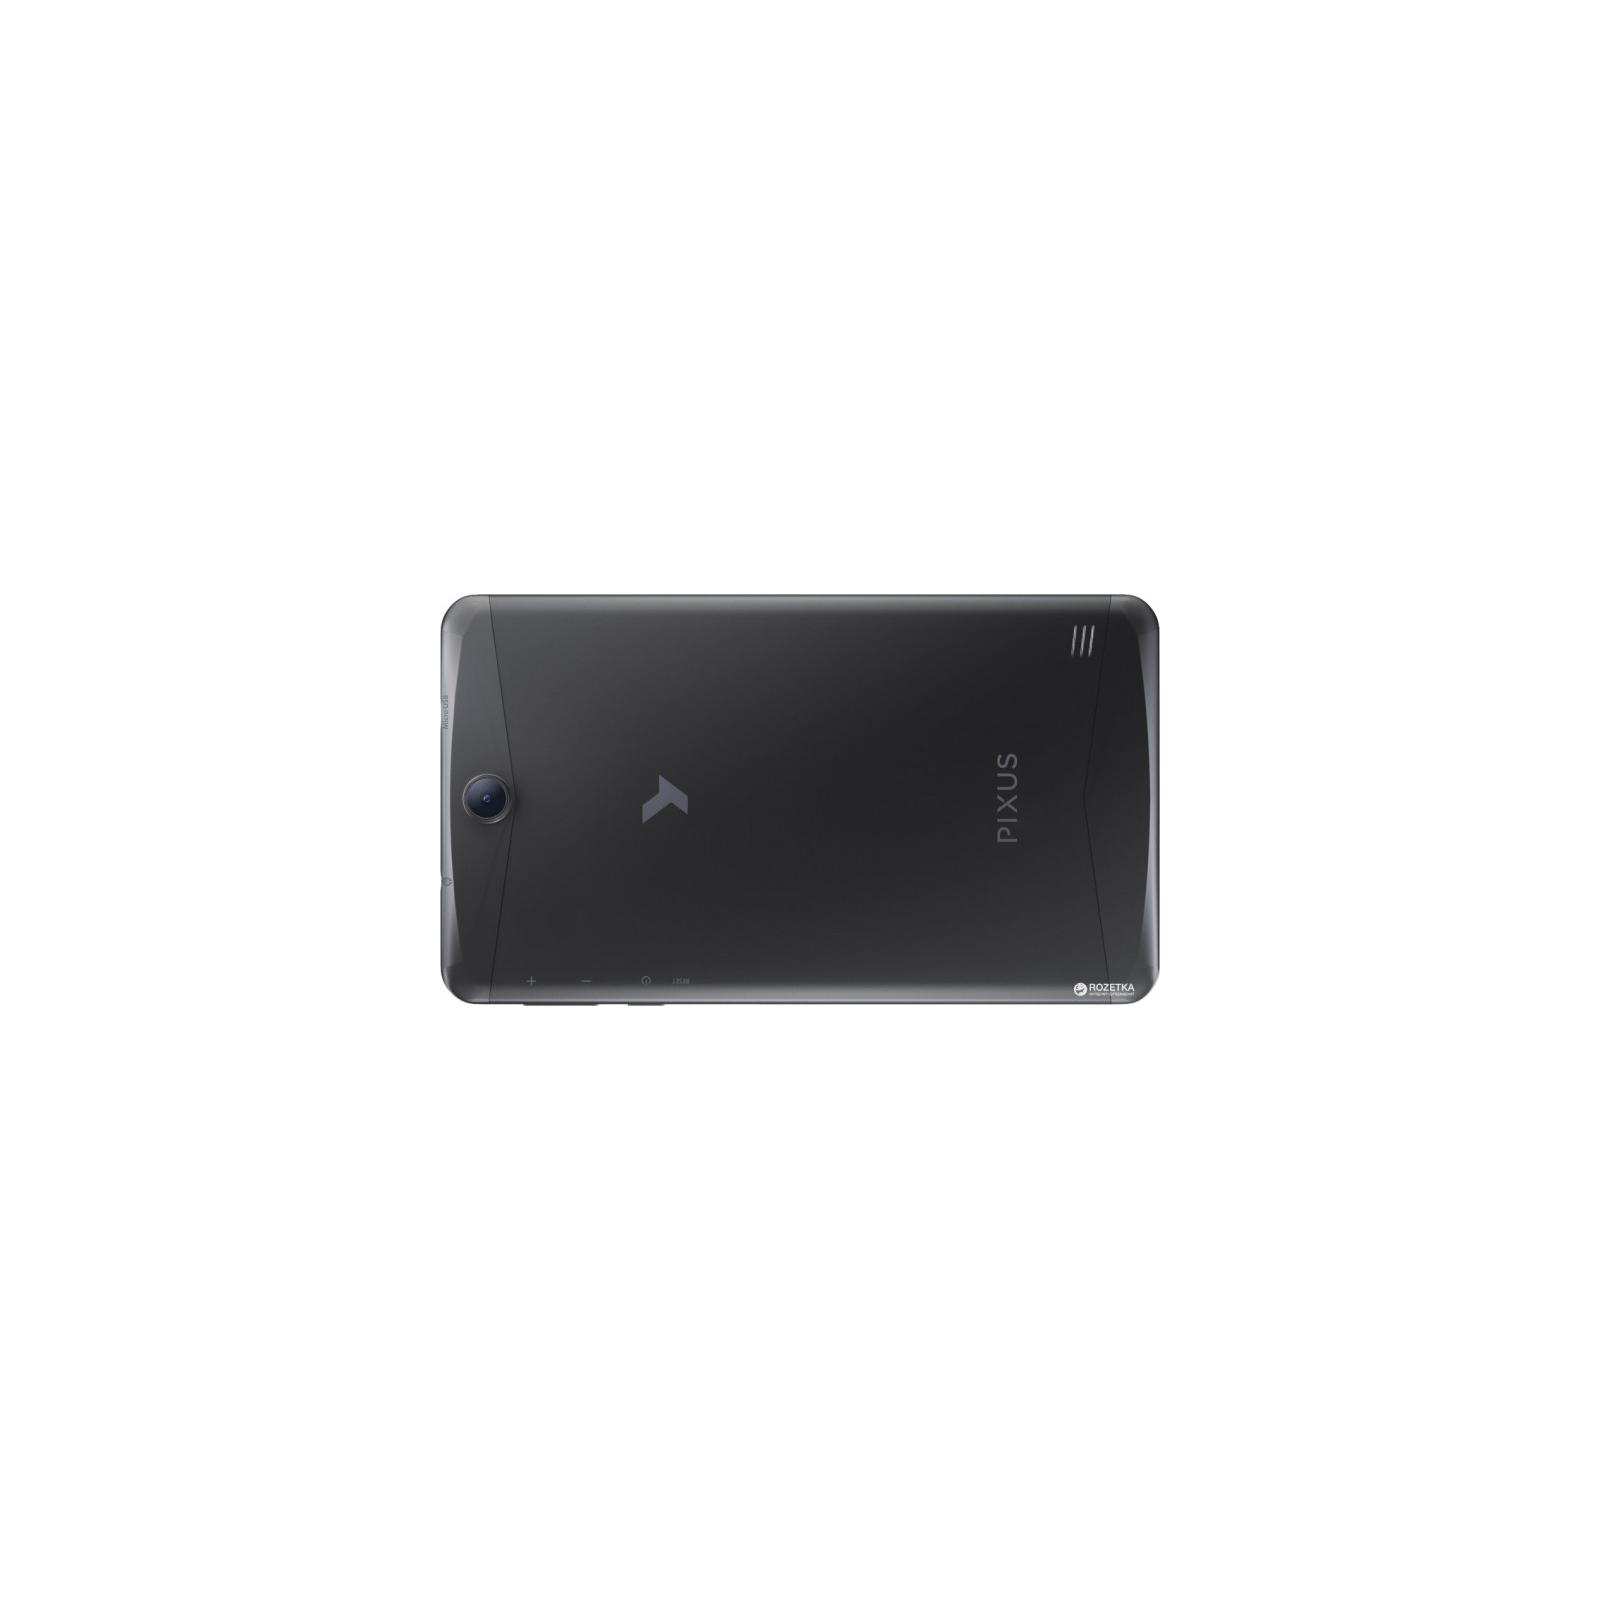 Планшет Pixus Touch 7 3G (HD) 2/16GB Metal, Black (4897058531213) изображение 7